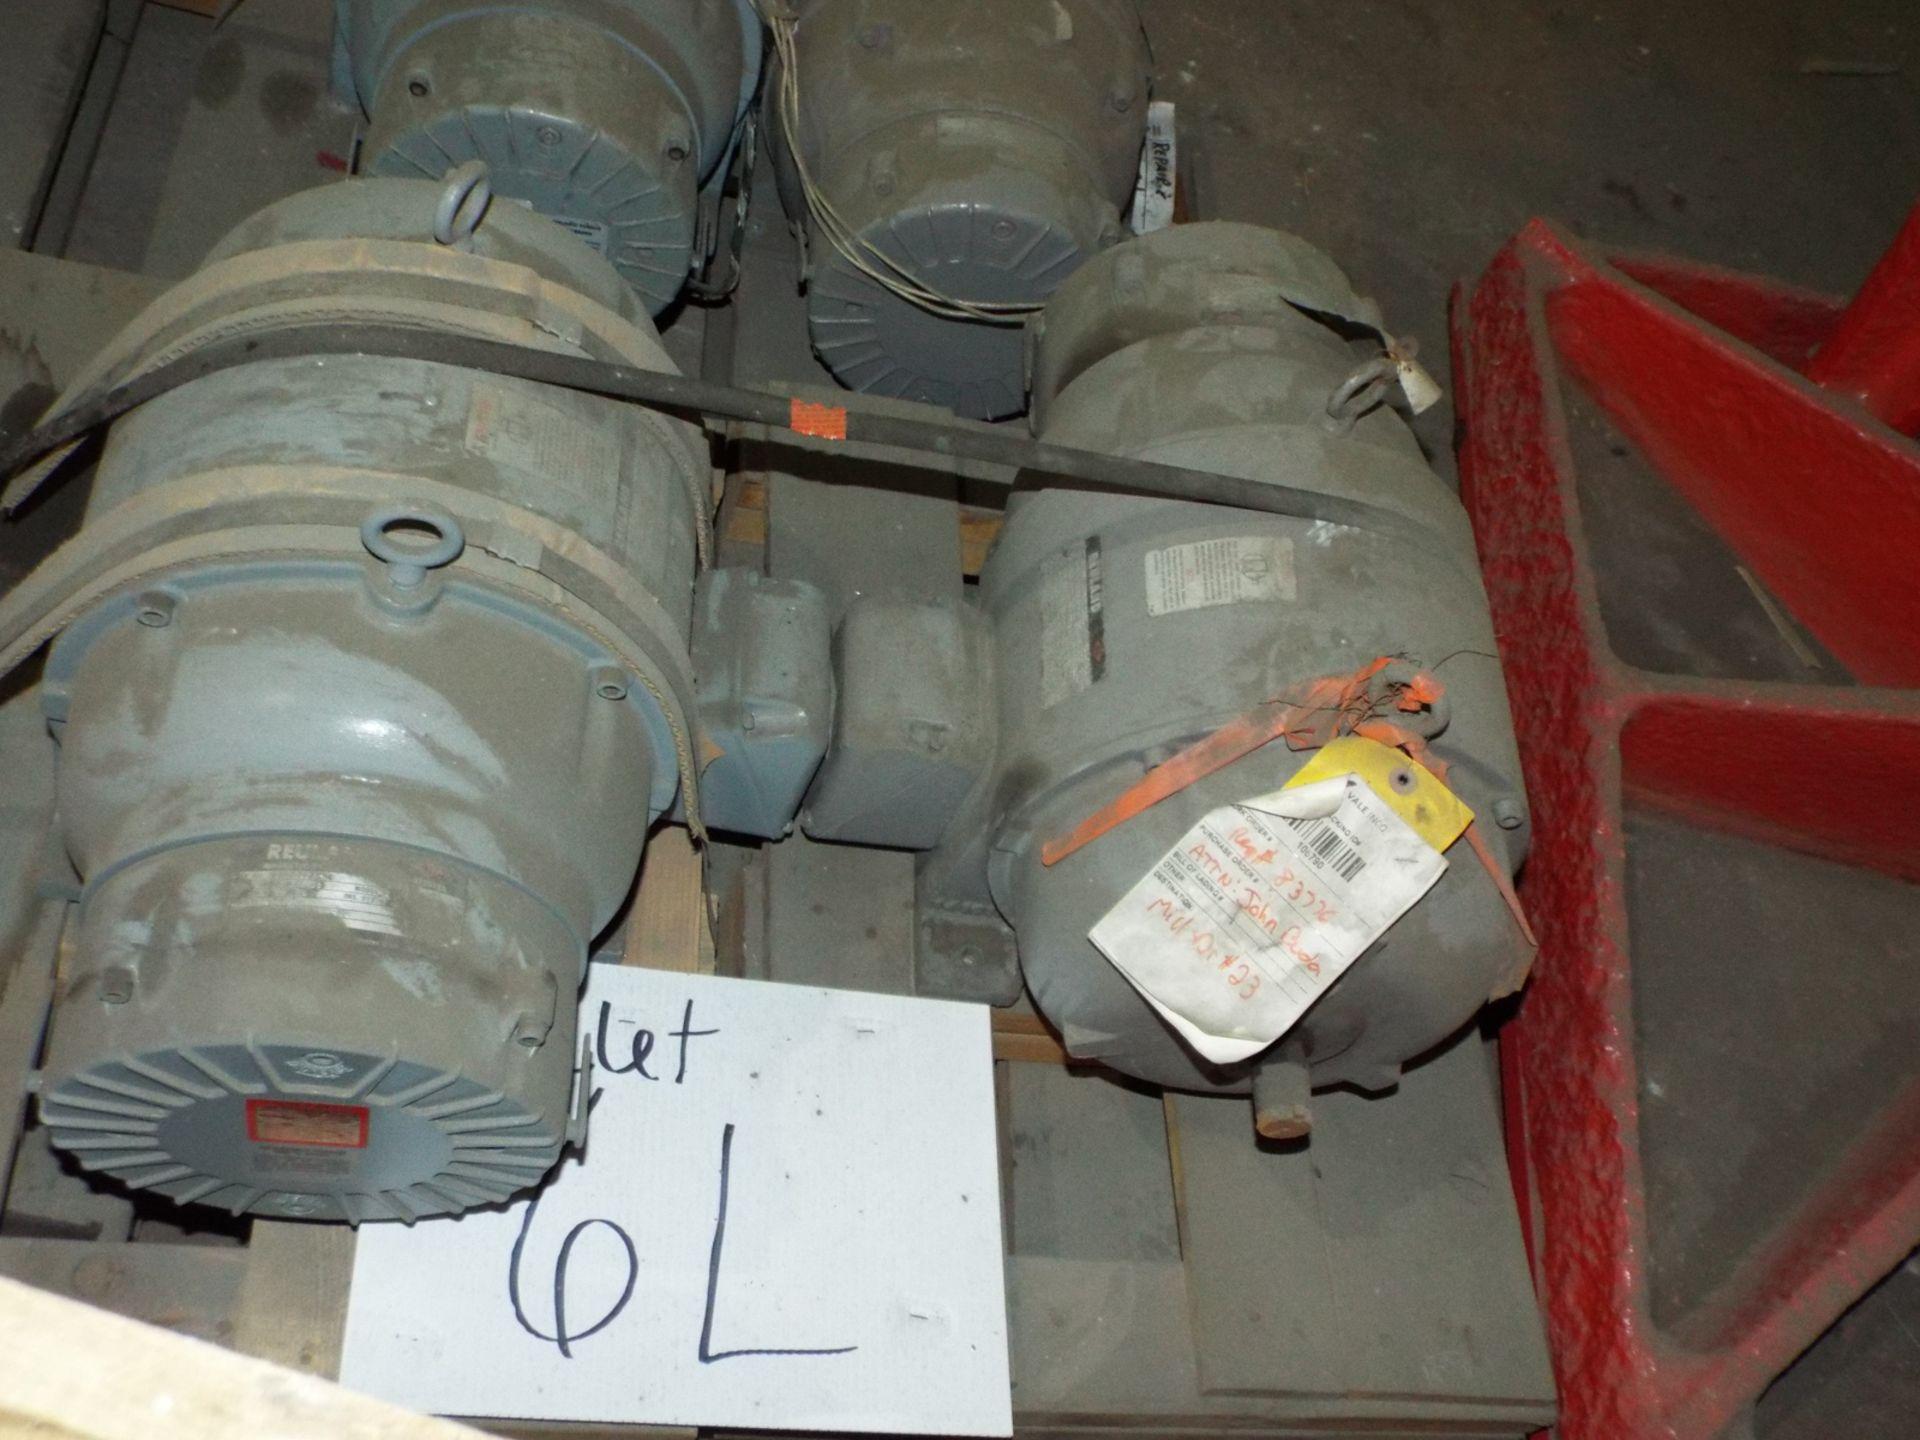 Lot 19 - LOT/ (4) REULAND HOIST MOTORS 7.5HP/1800RPM/575V/3PH/60HZ/254U WITH MAGNETIC BRAKE (PLT 6L)